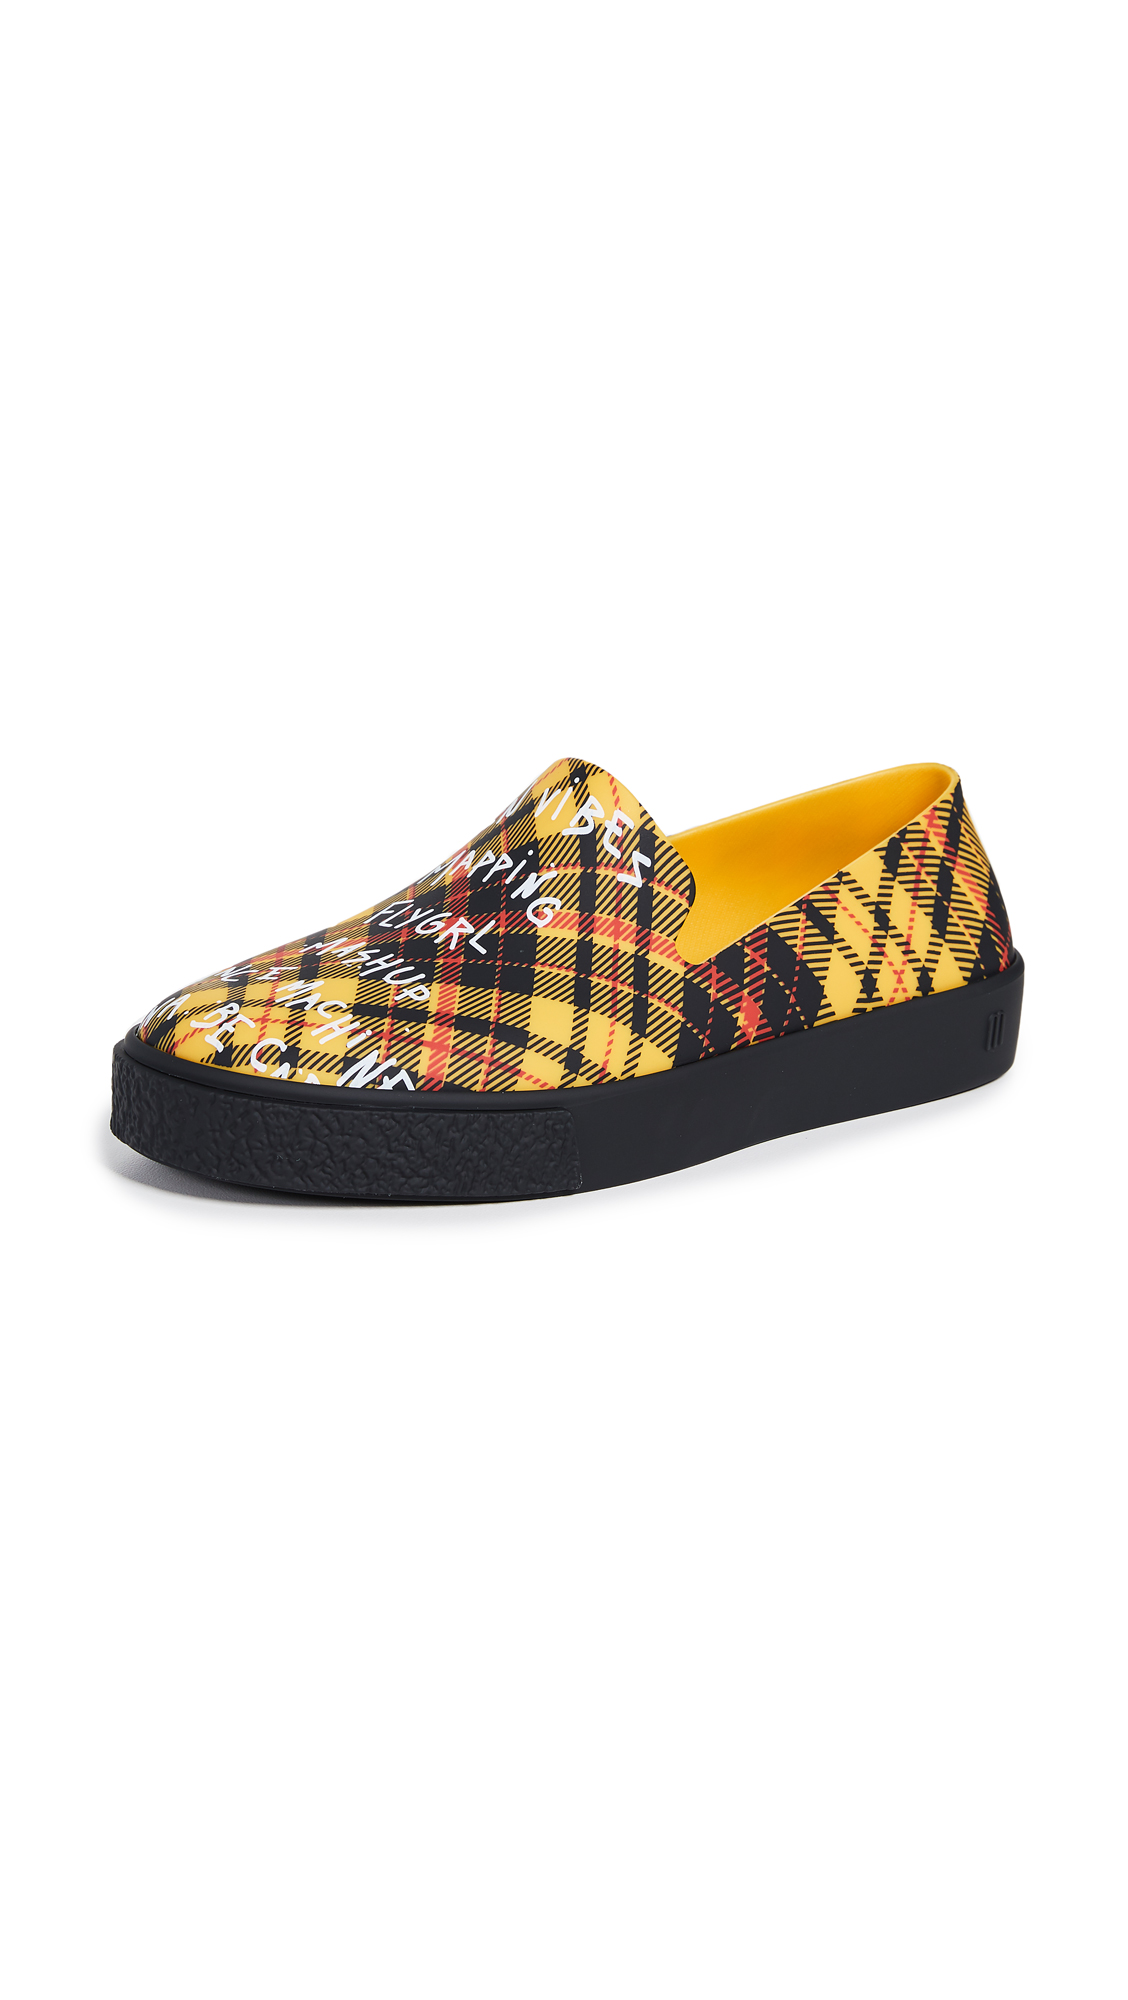 Melissa Ground Slip On Sneakers - Yellow/Black